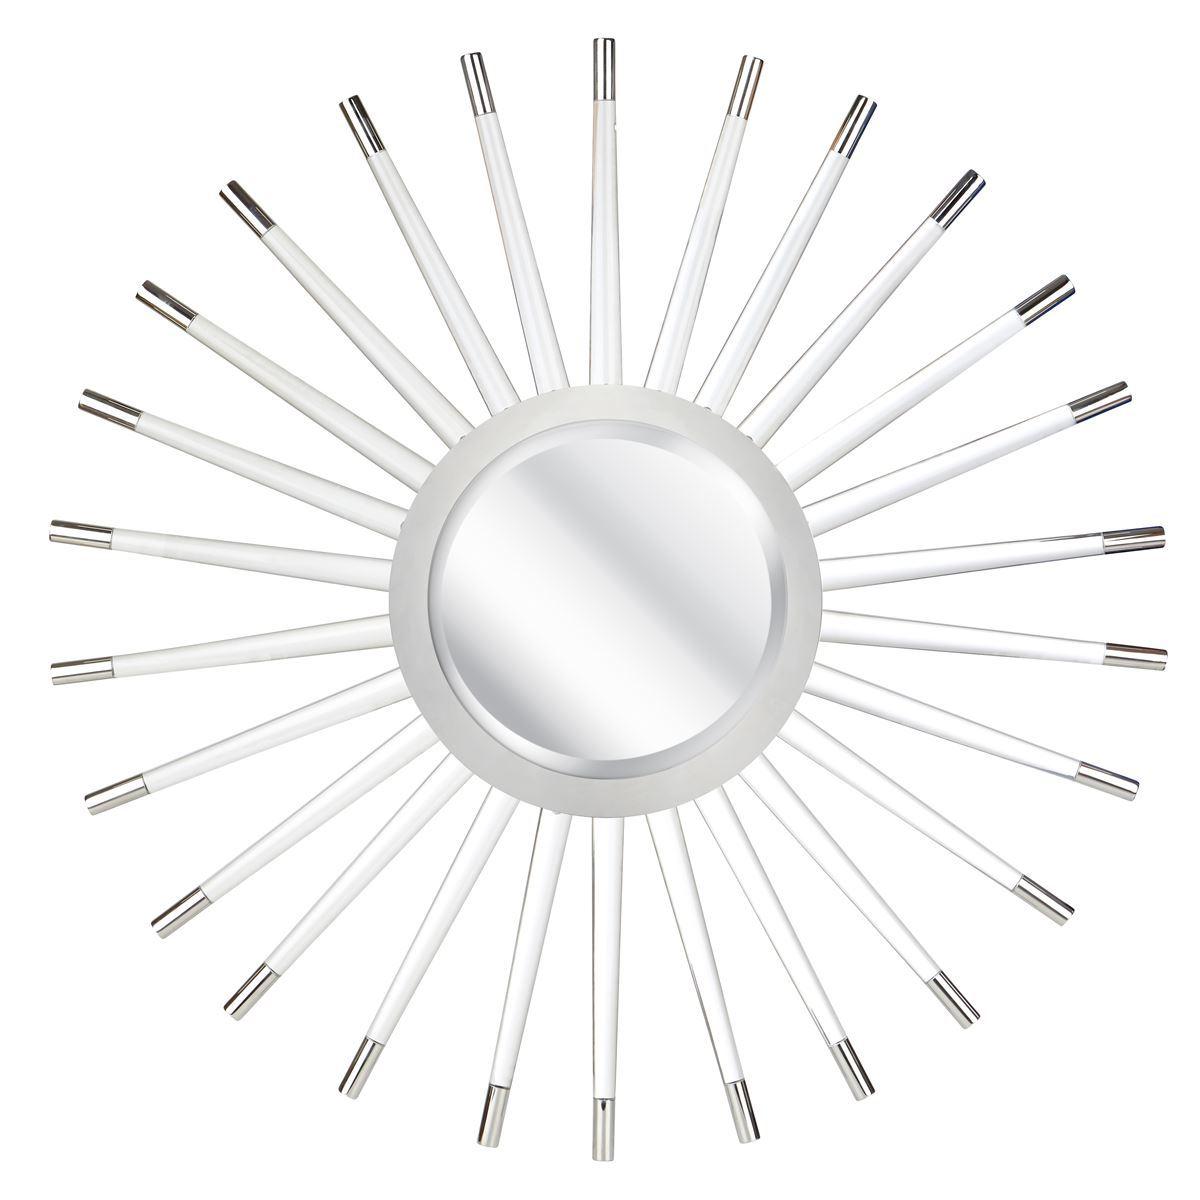 nk-acrylic-stainless-steel-starburst-lucite-sunburst-large-round-decorative-mirror.jpg